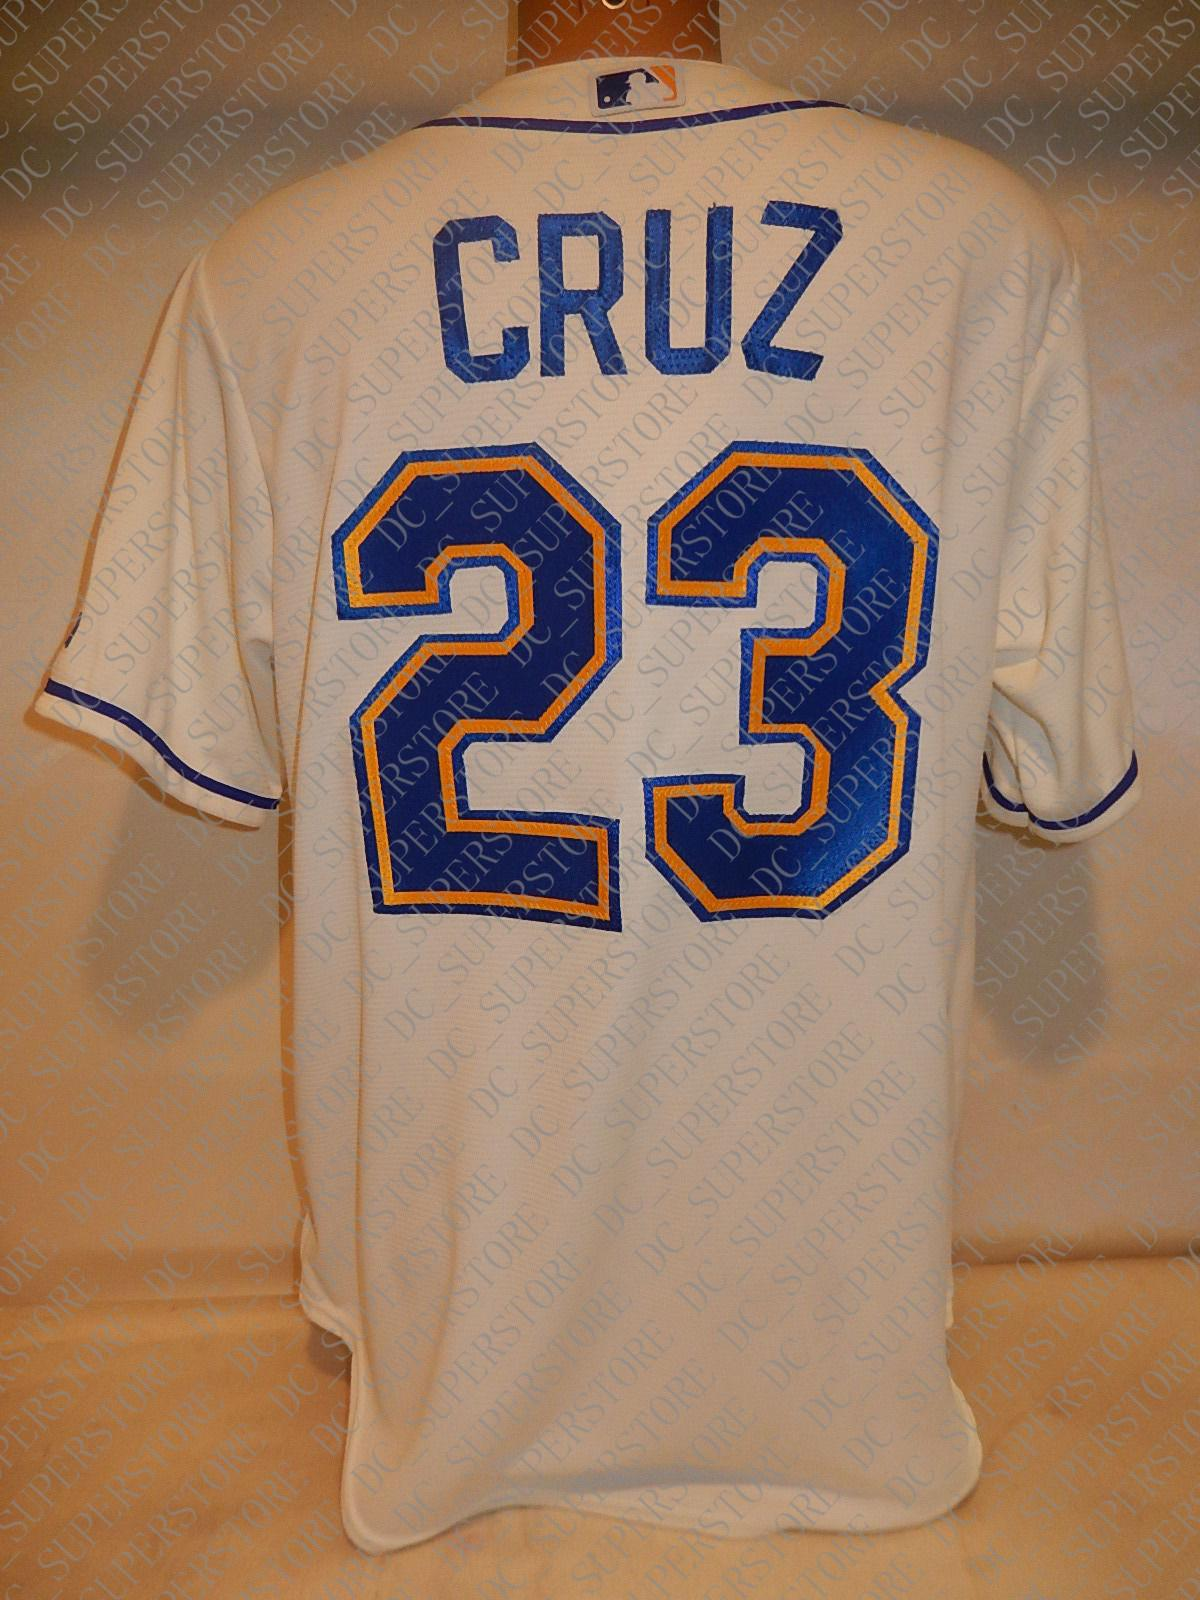 100% bordados personalizados NELSON CRUZ Jerseys Branco New costurado Mens camisola Personalizar qualquer número nome MEN XS-5XL NCAA JERSEY